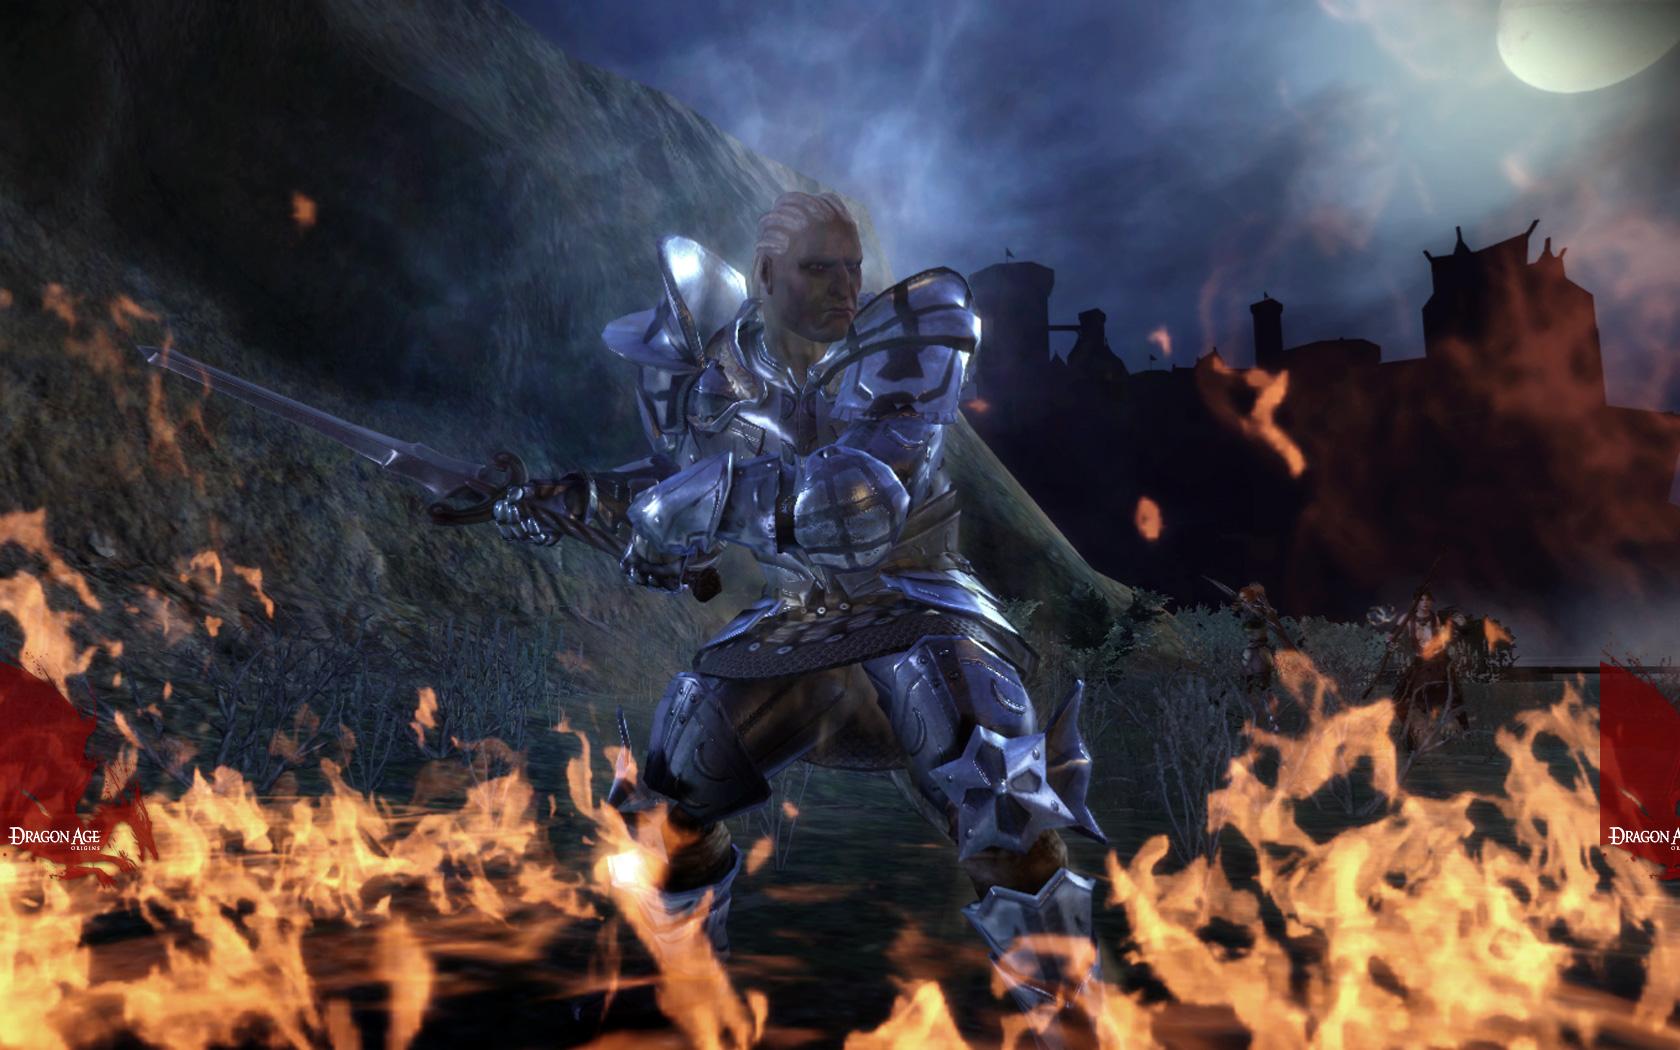 sten image - dragon age: origins - mod db